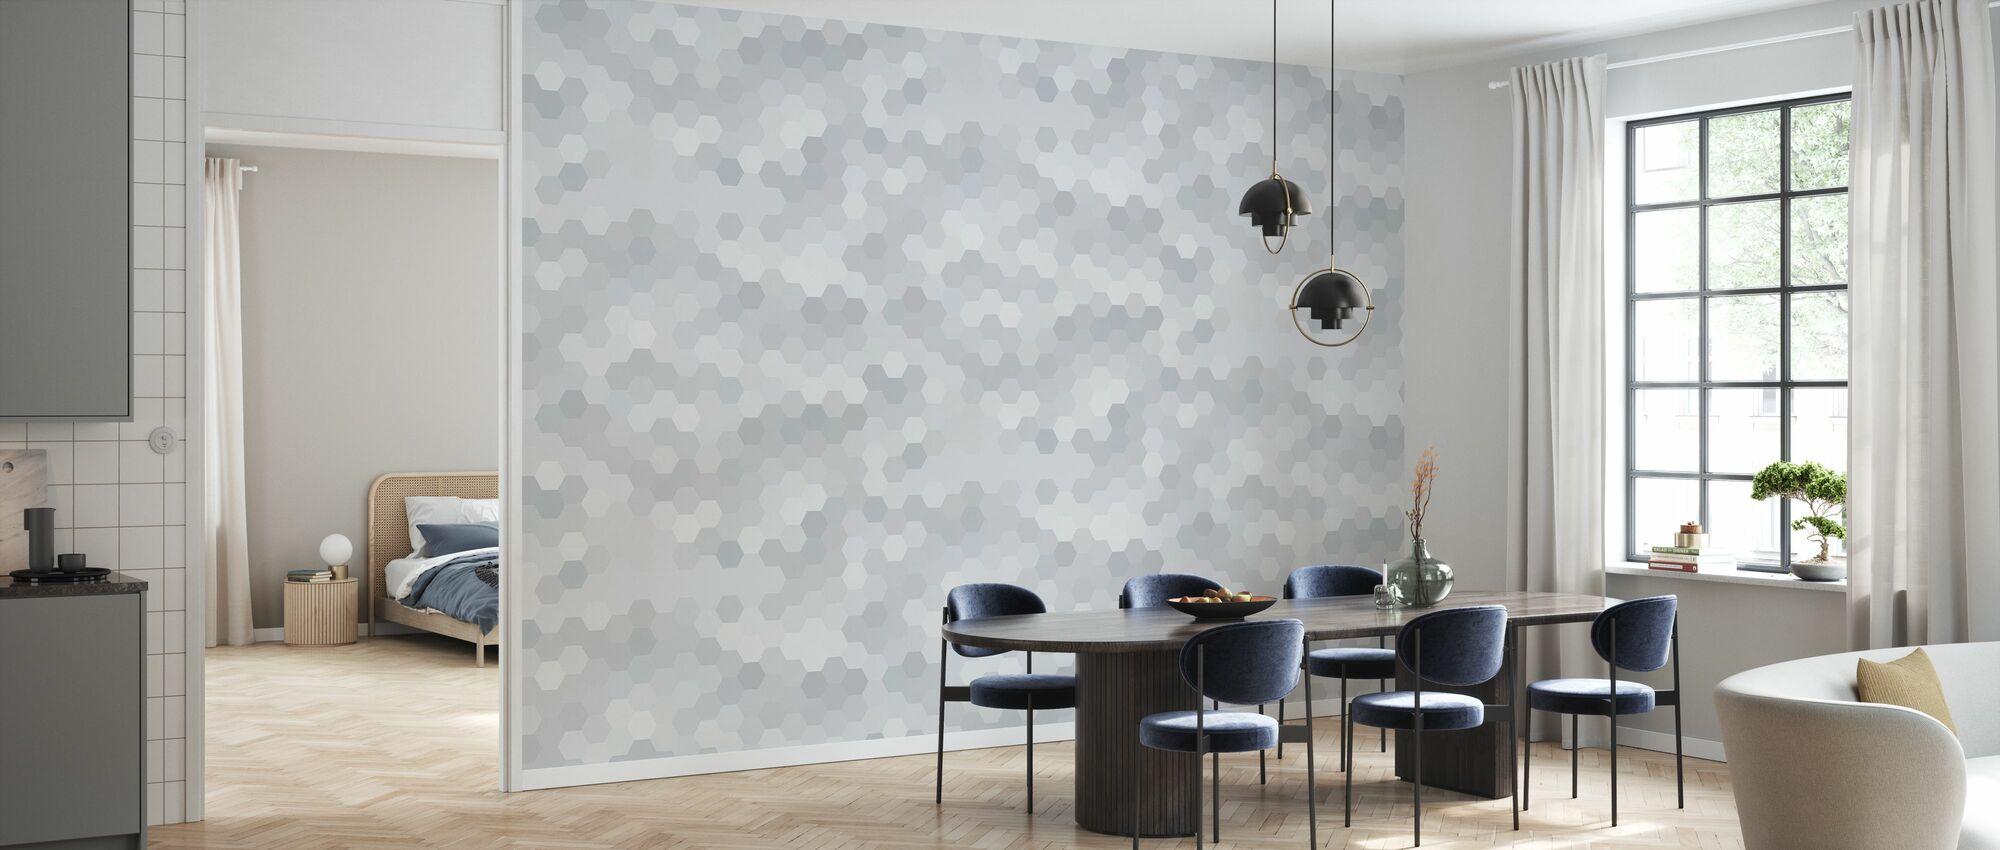 Abstrakt Mosaik - Varm Grå - Tapet - Kök